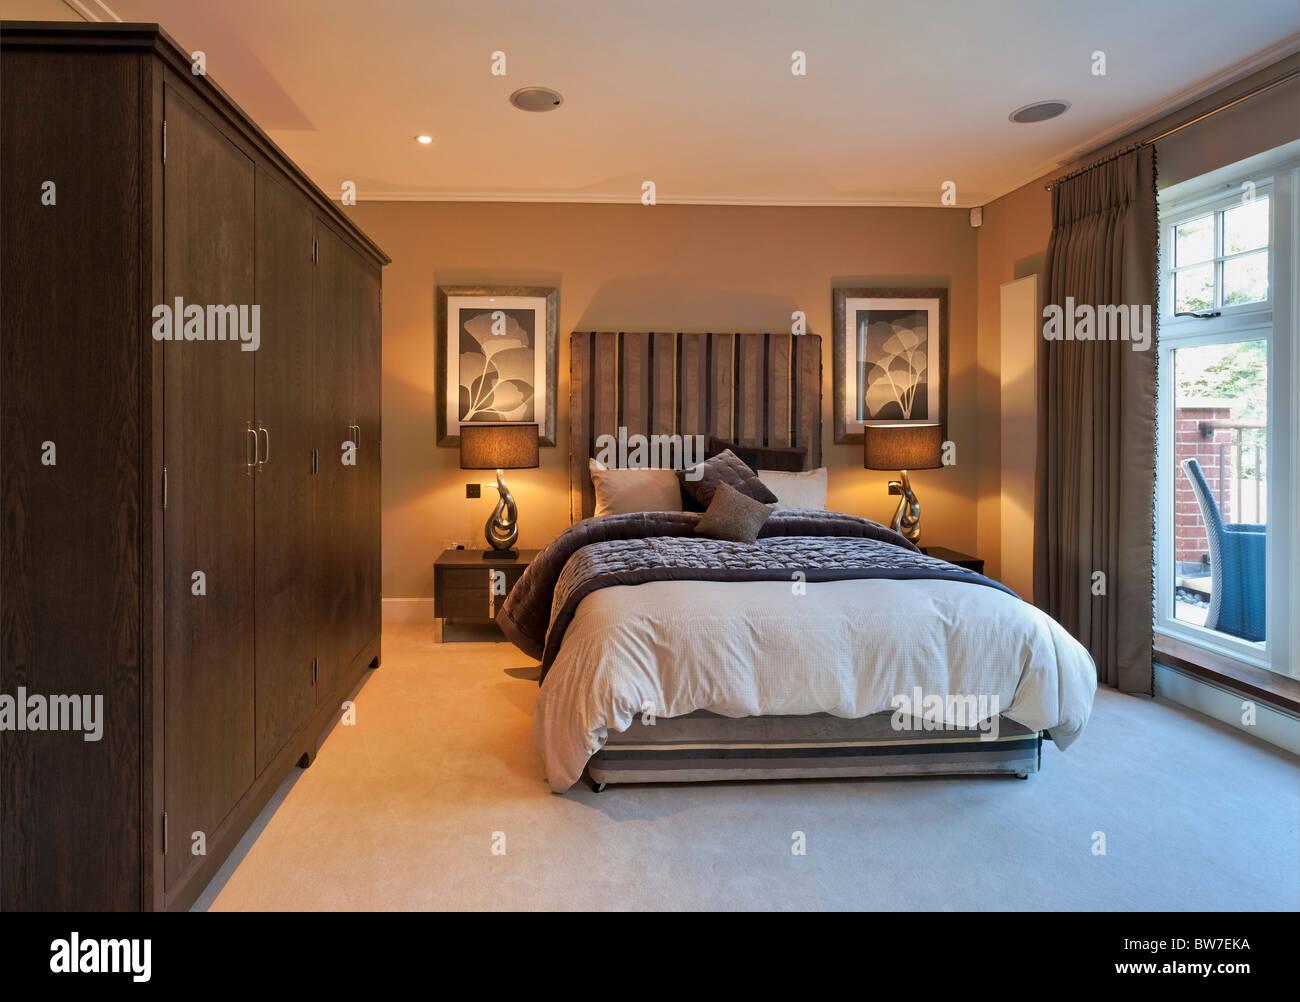 Grange Chigwell viviendas de lujo en Essex. Imagen De Stock